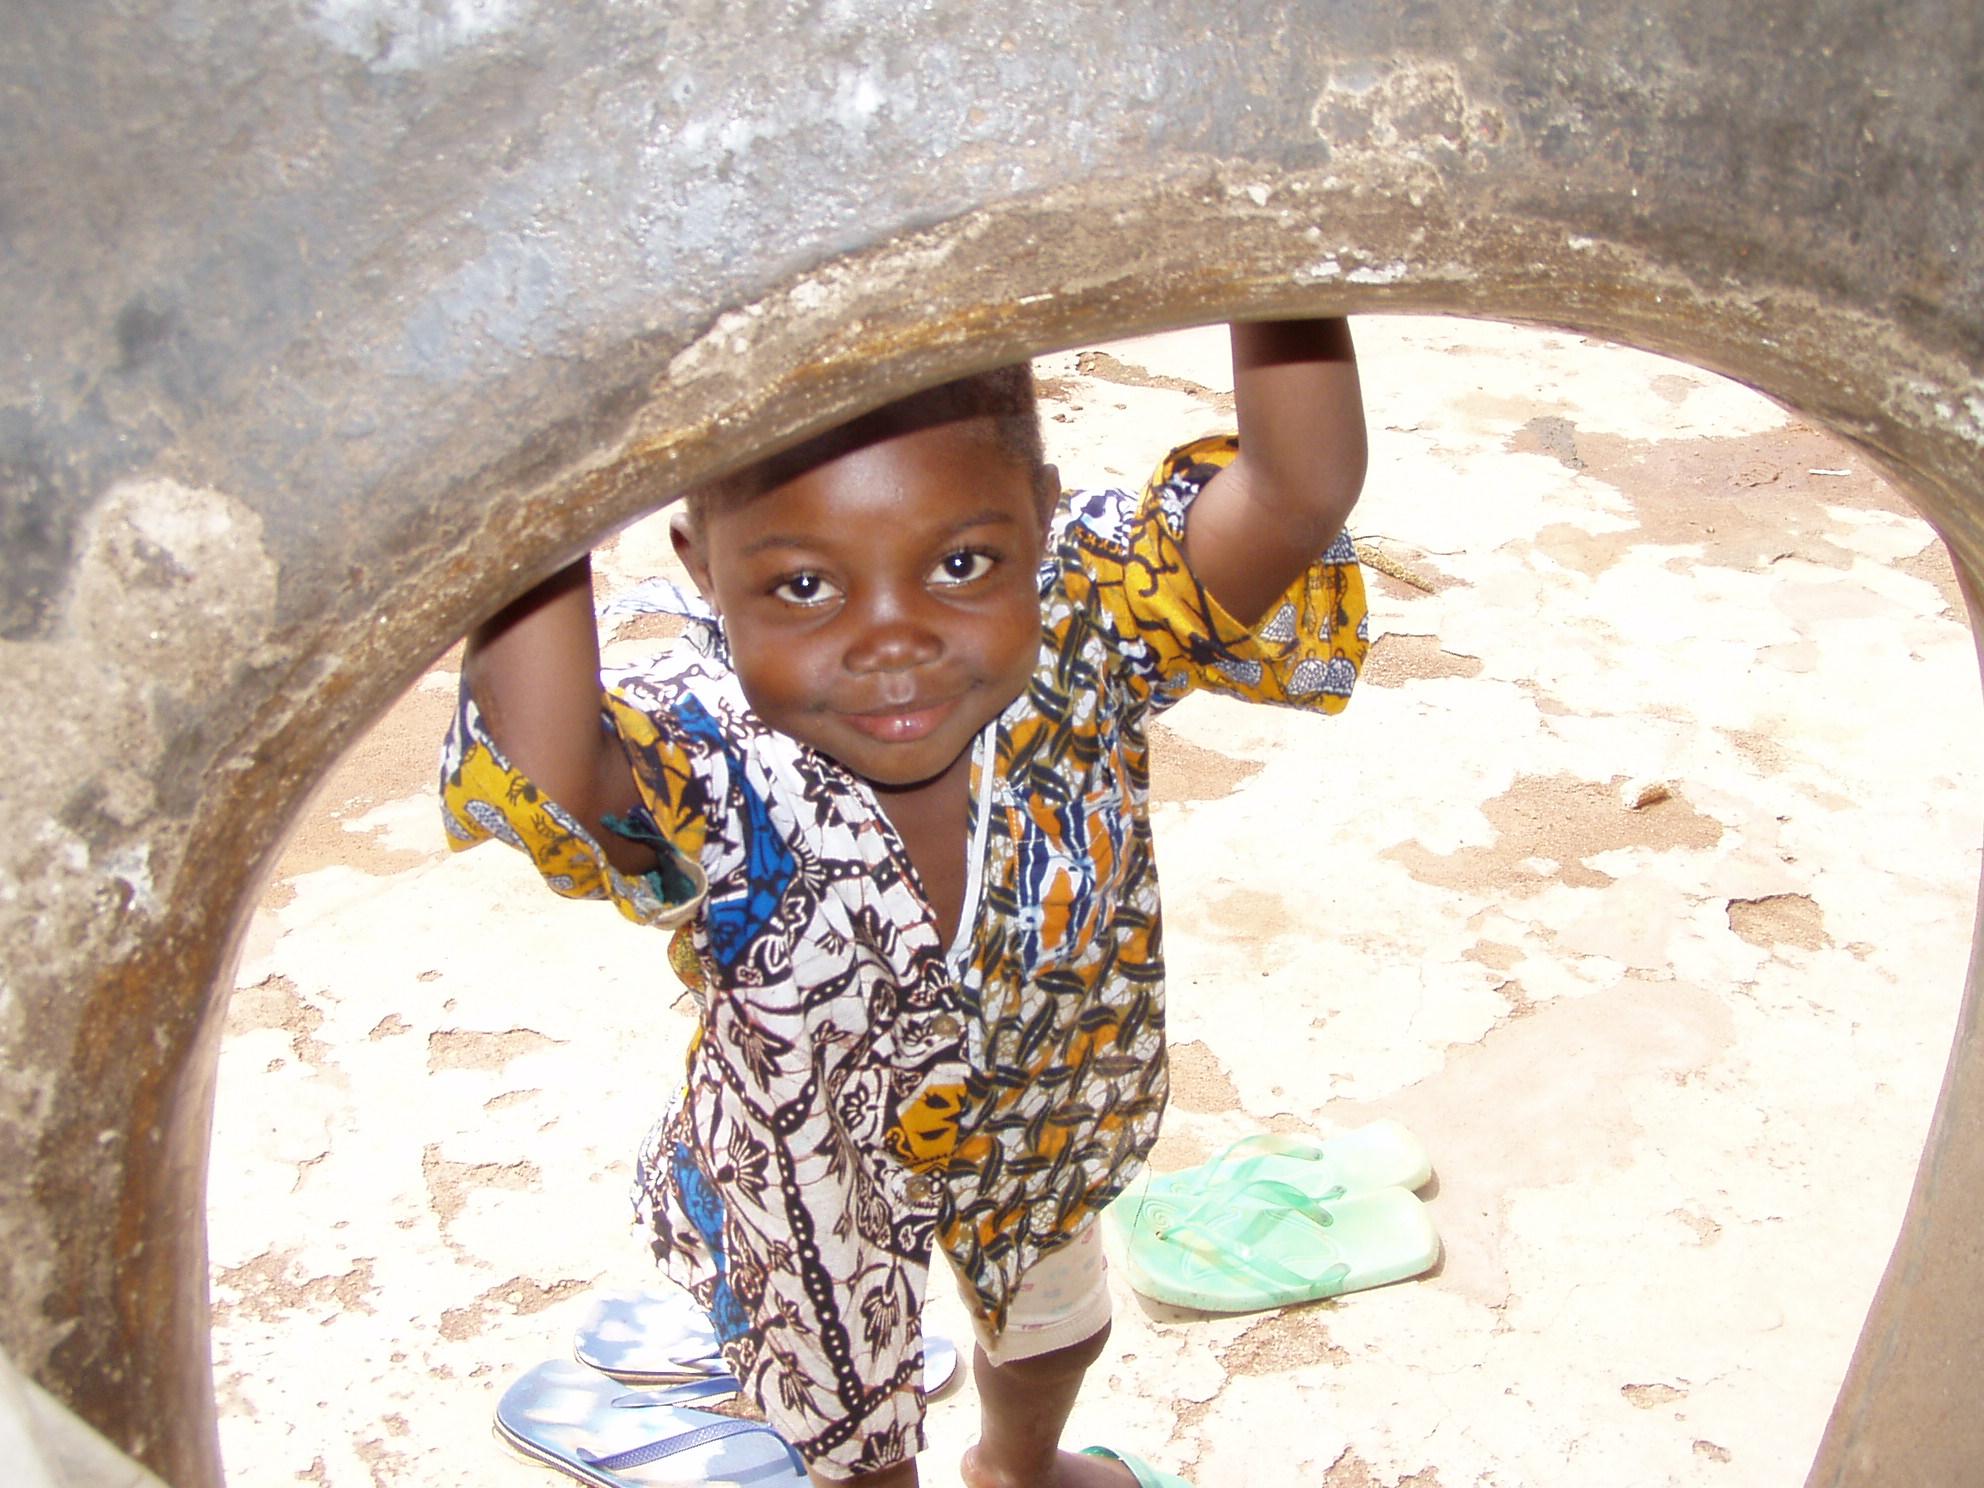 Garçon en train de sourire. Boy looking with a smile.